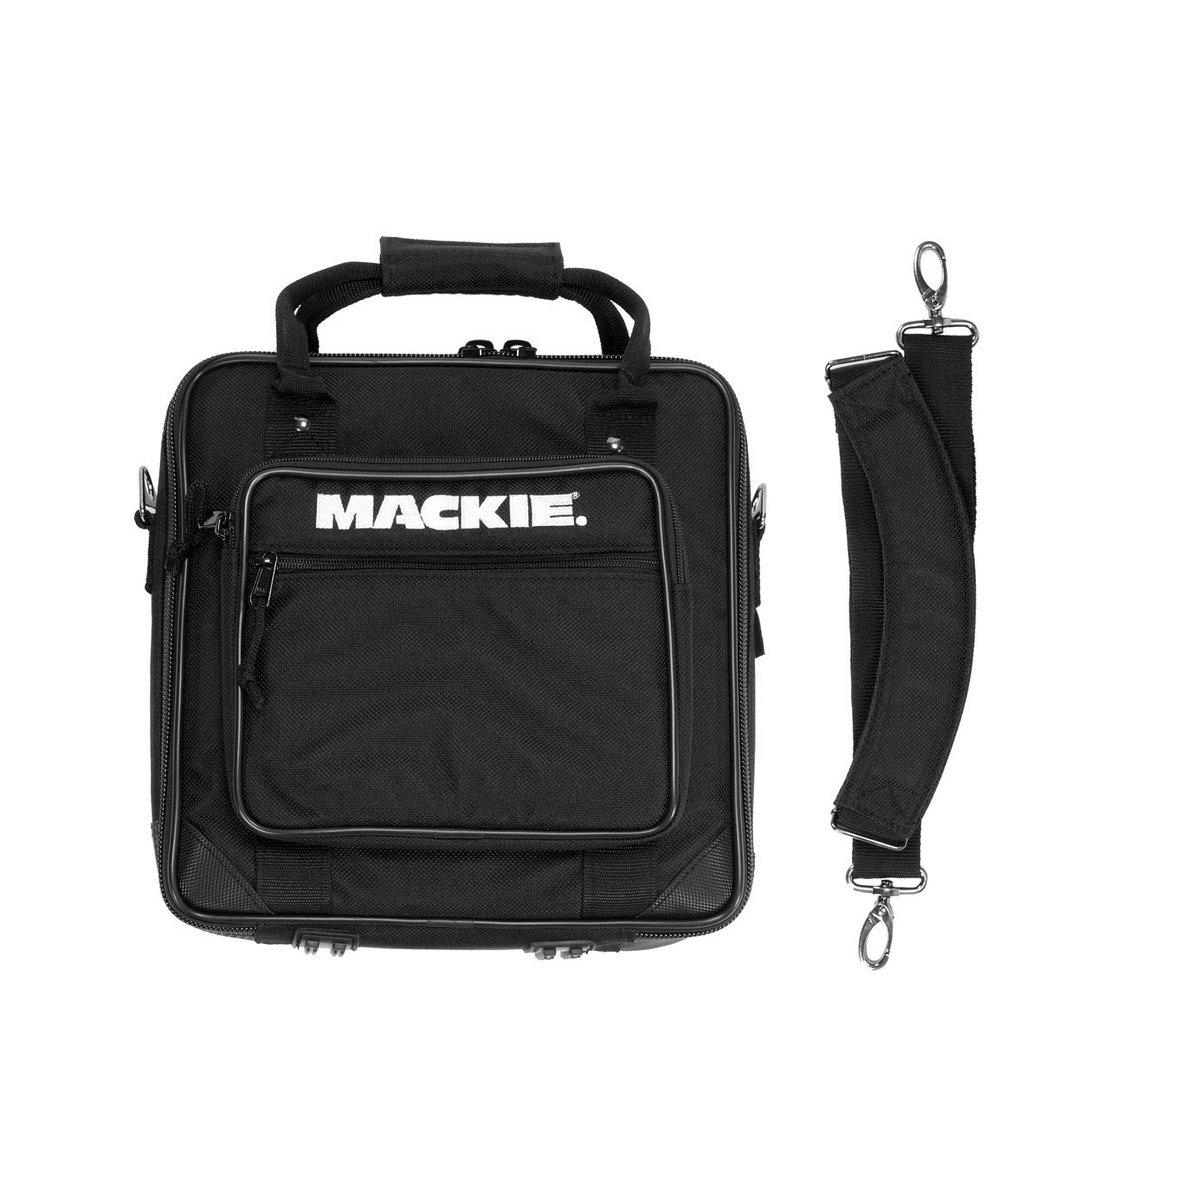 Mackie ProFX12 / DFX12 Bag by Mackie